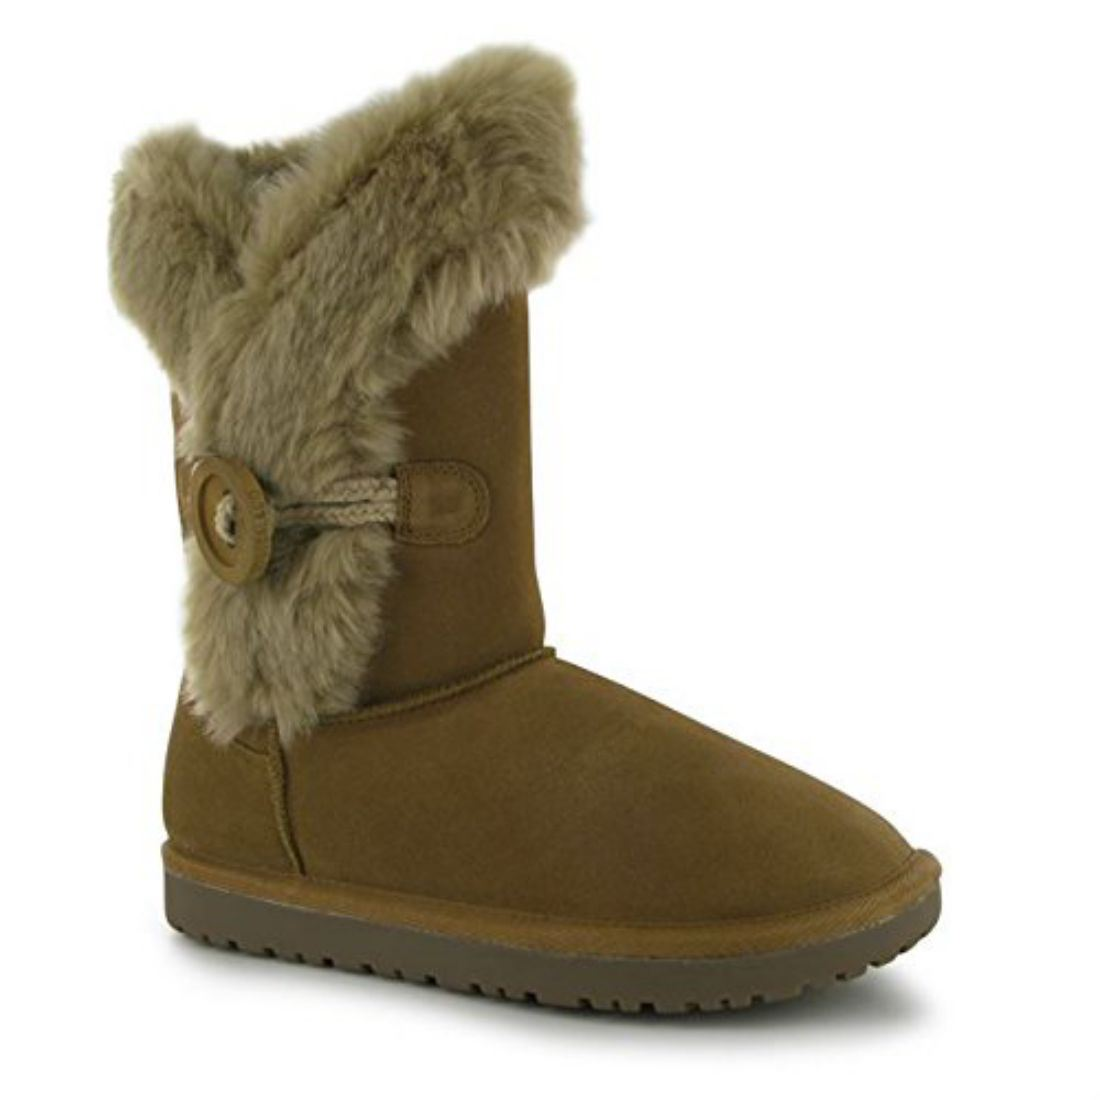 SoulCal Womens Button Ladies Snug Boots Winter Shoes Faux